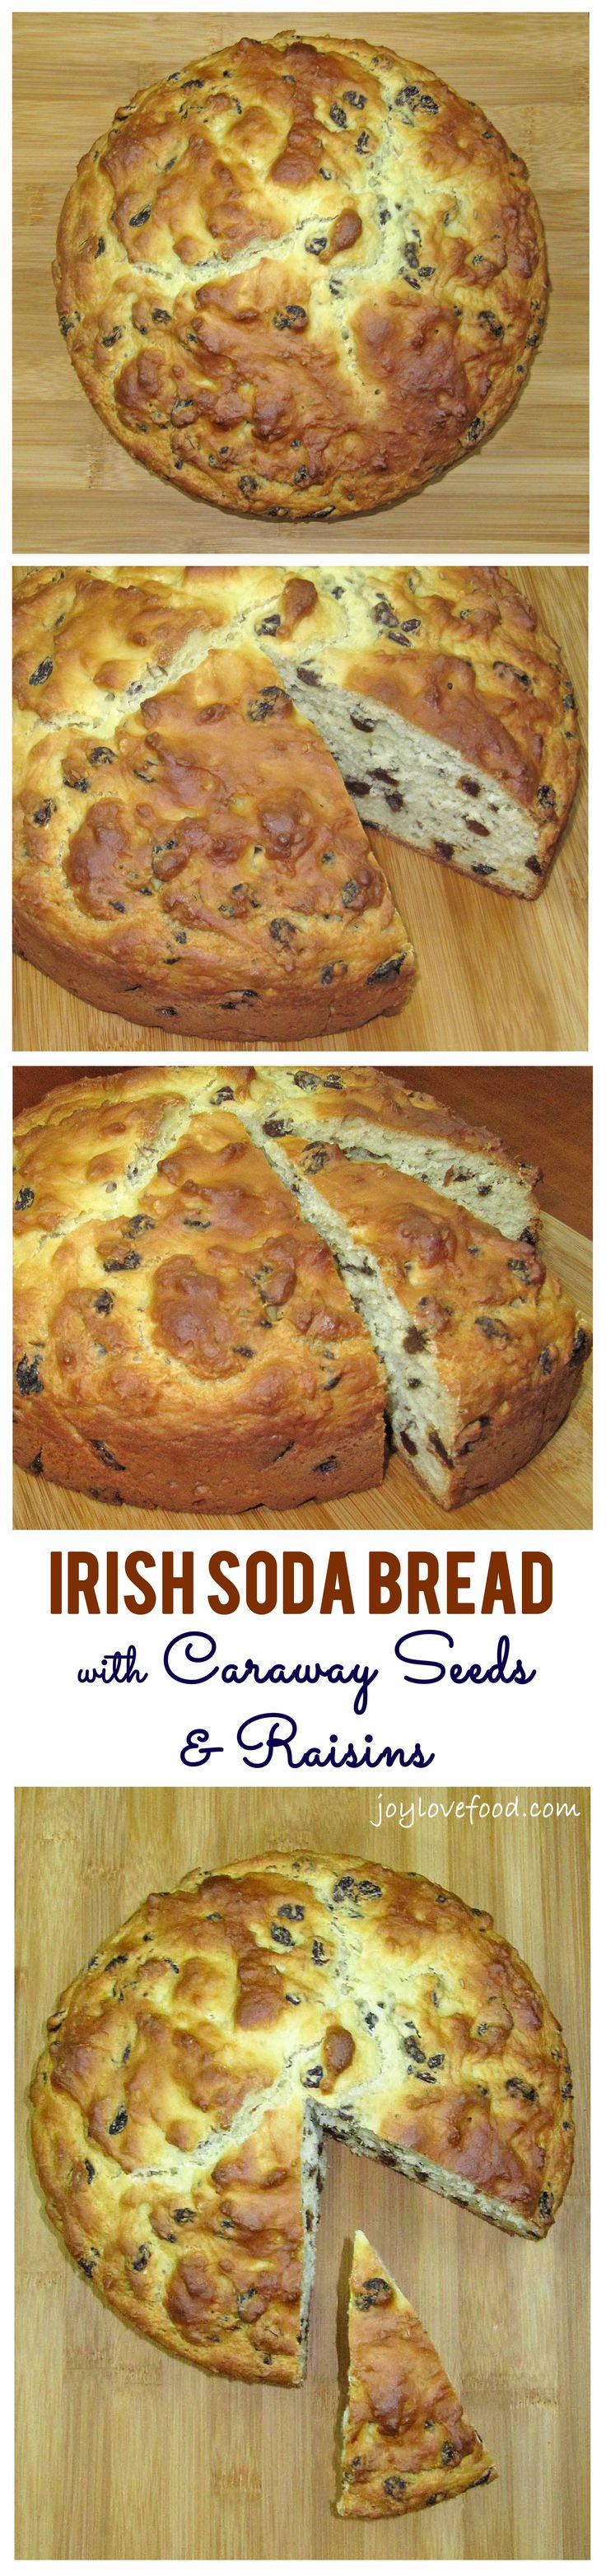 Irish Soda Bread with Caraway Seeds and Raisins